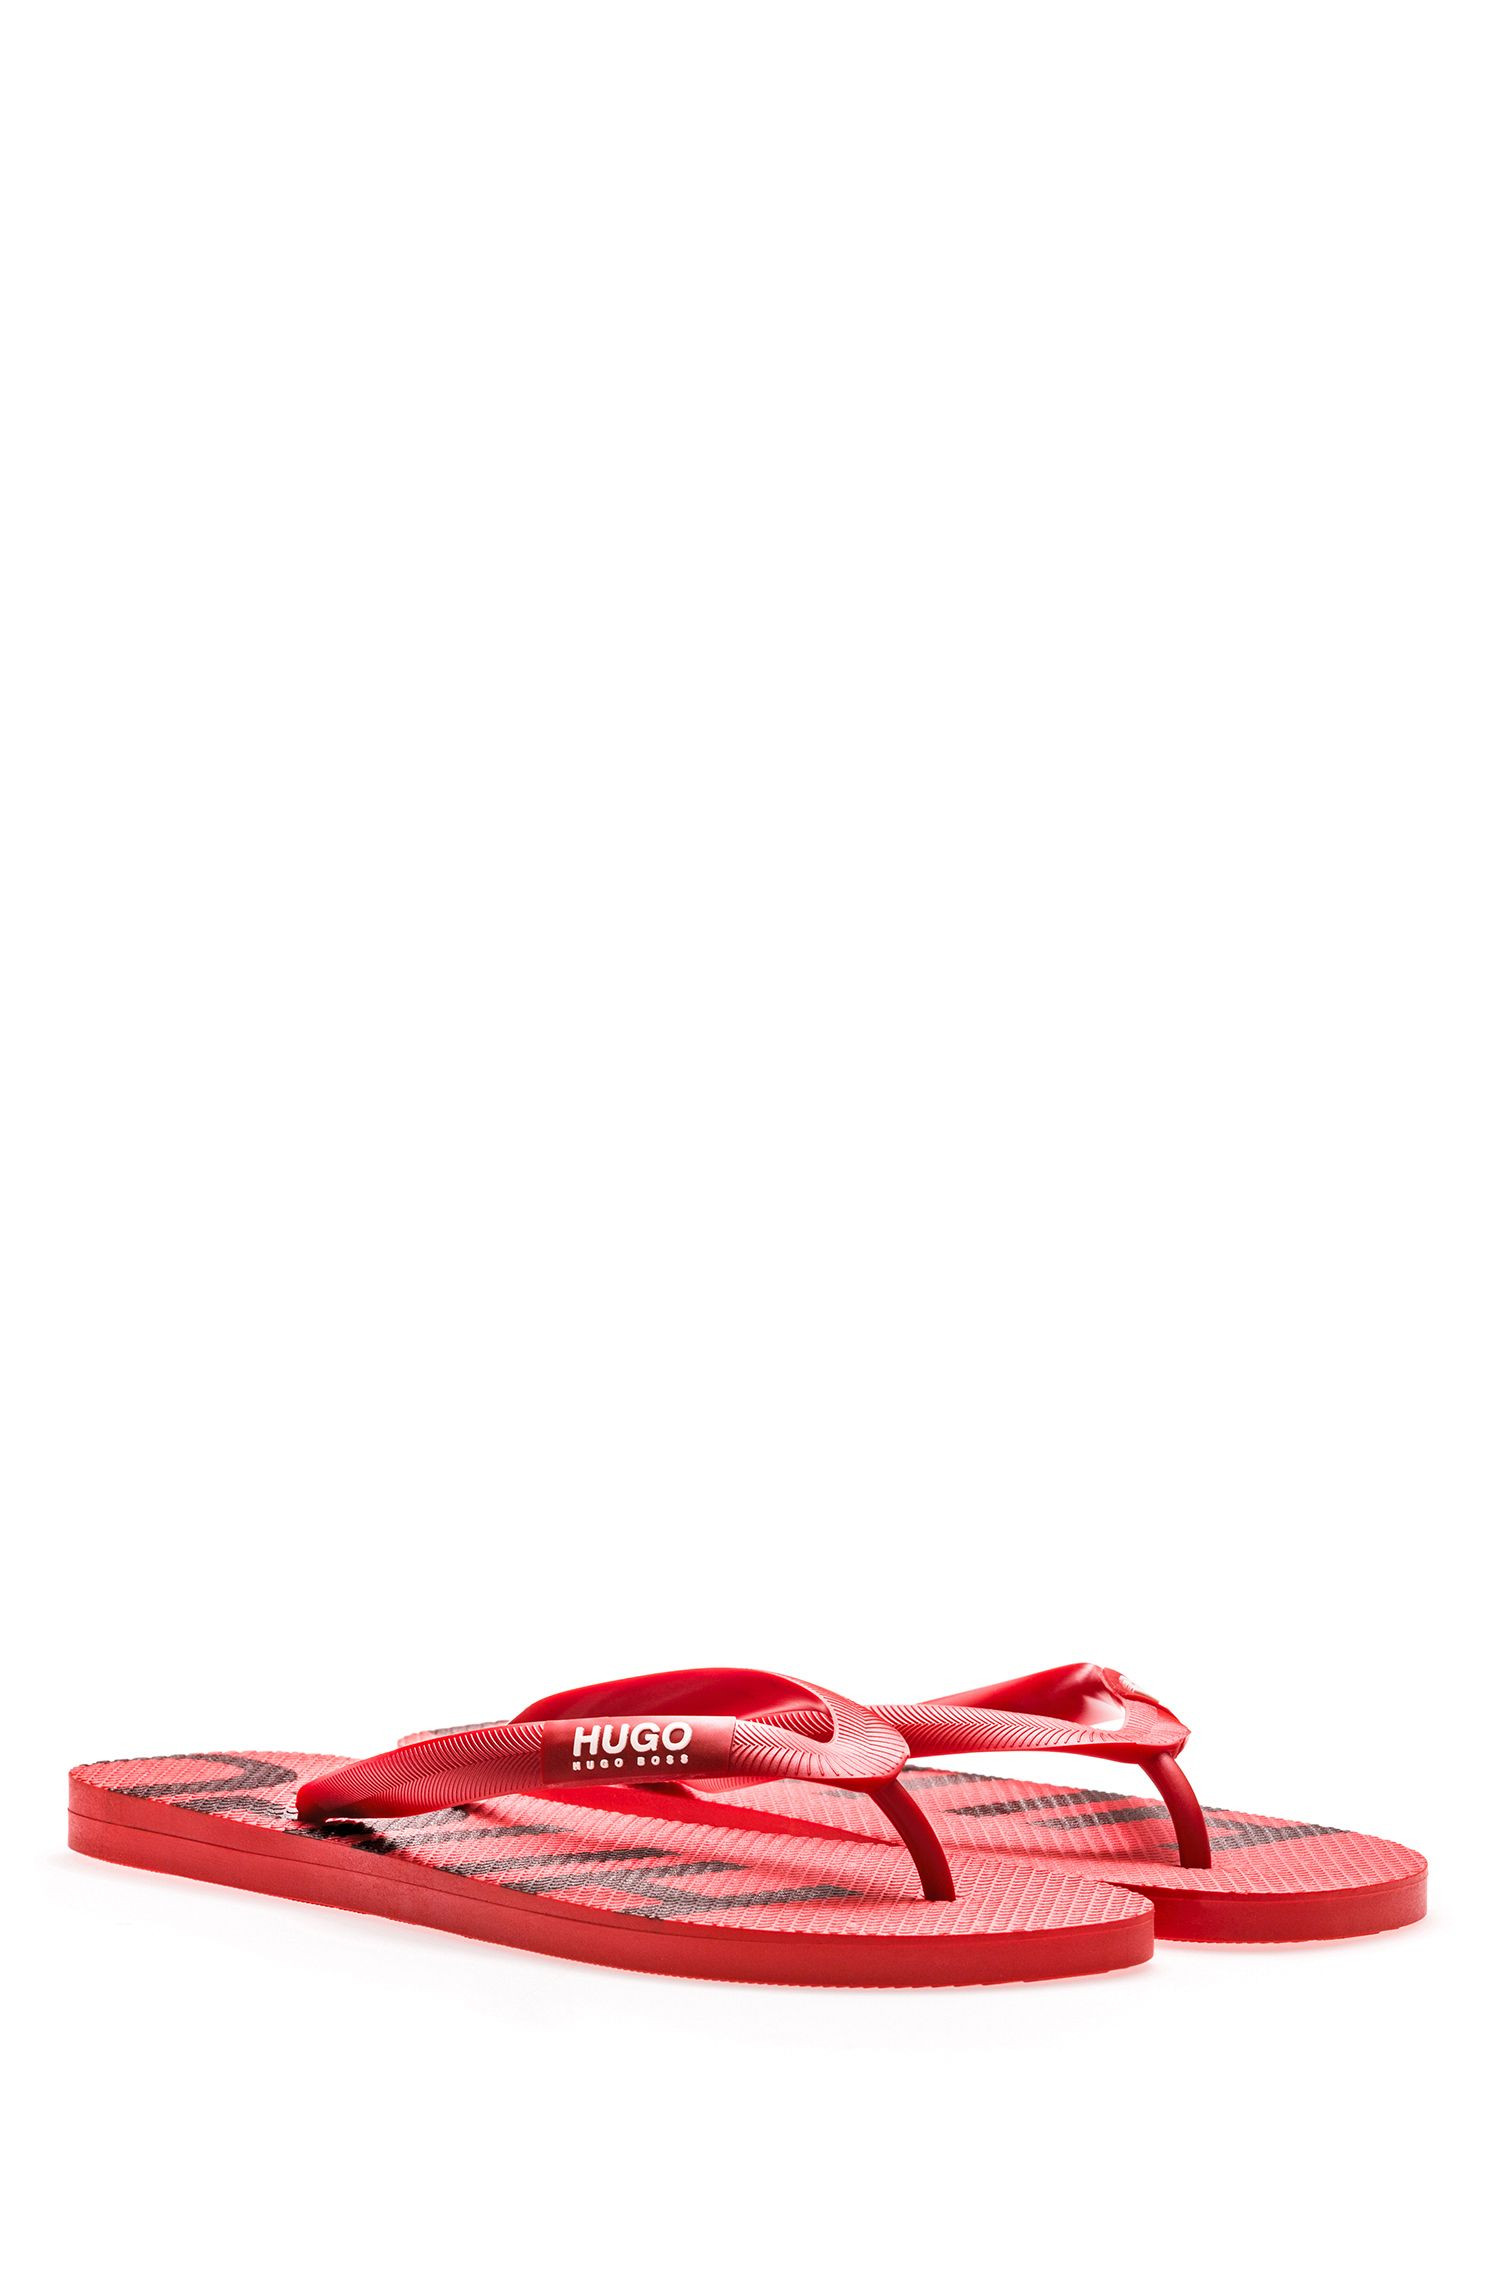 Lightweight flip-flops with branded sole